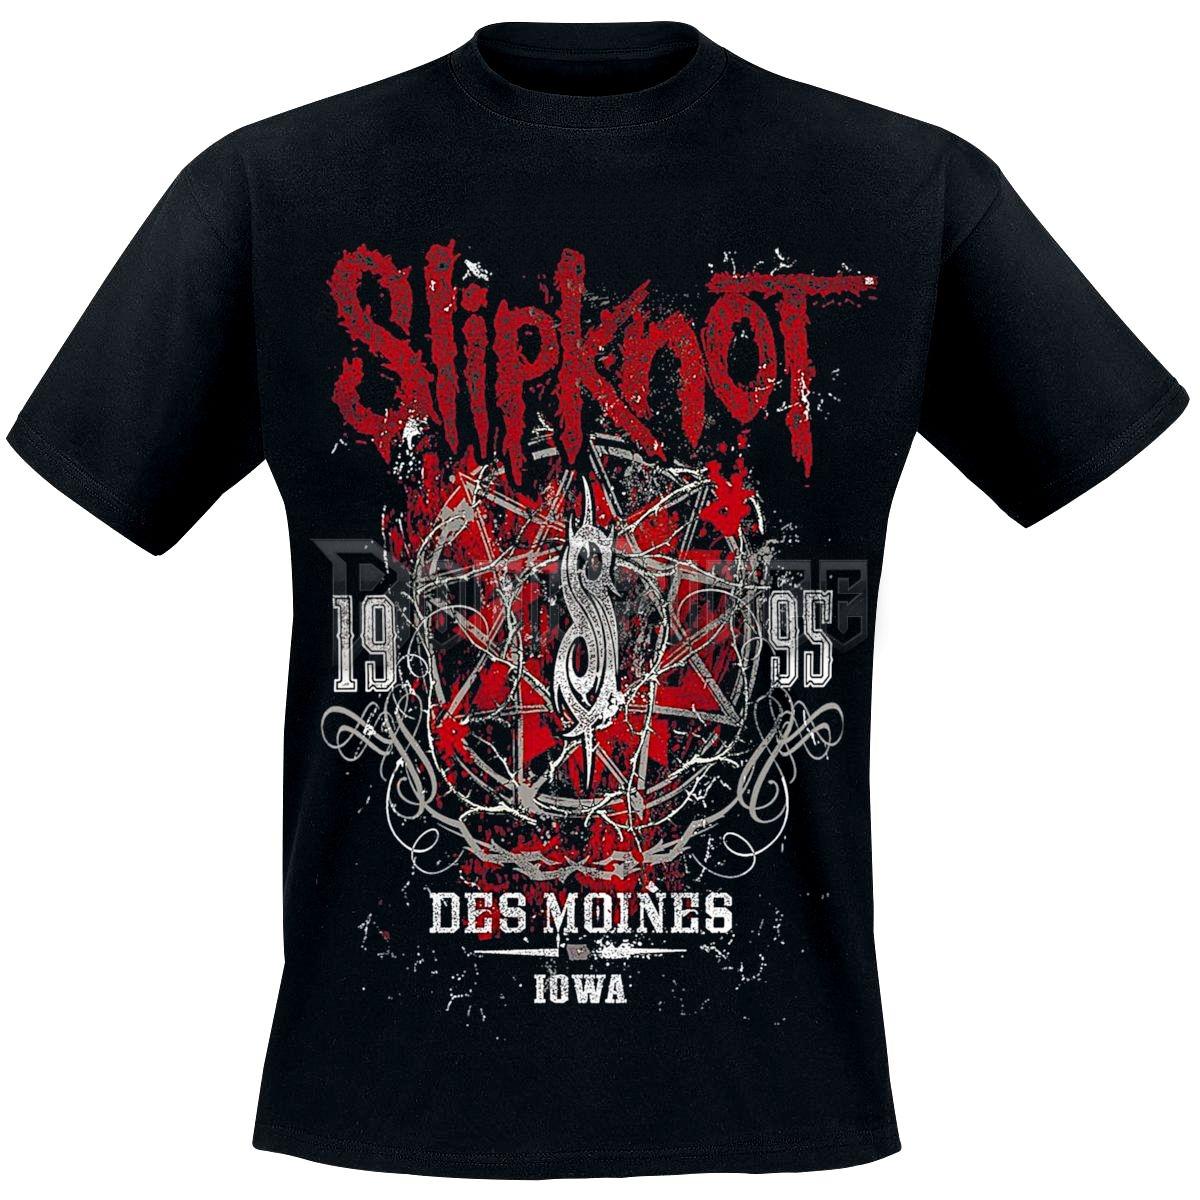 SLIPKNOT - DES MOINES IOWA